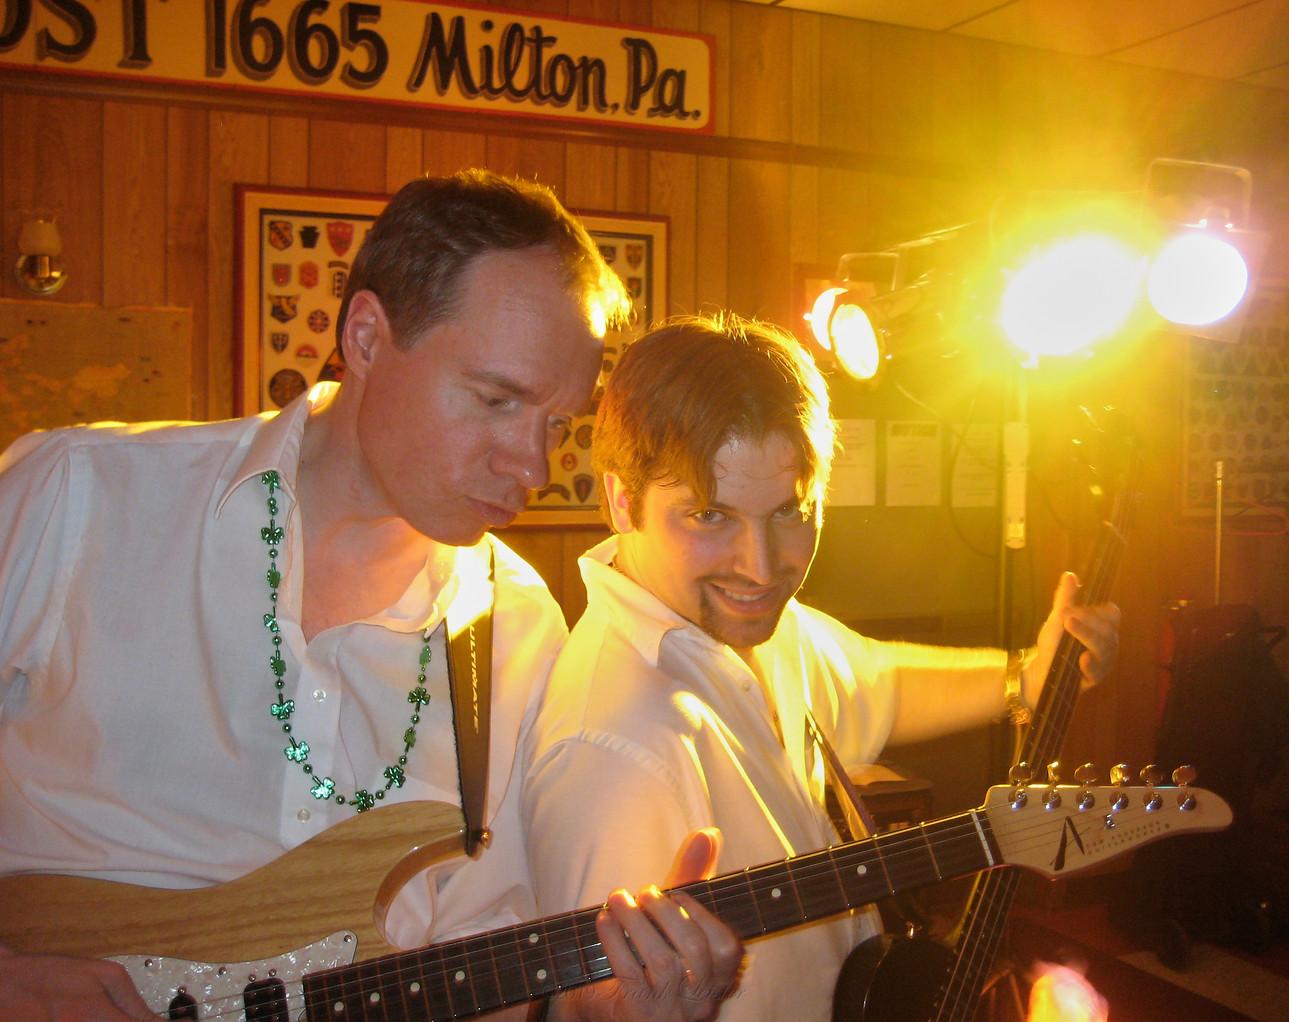 Milton PA, May 23 2009.jpg